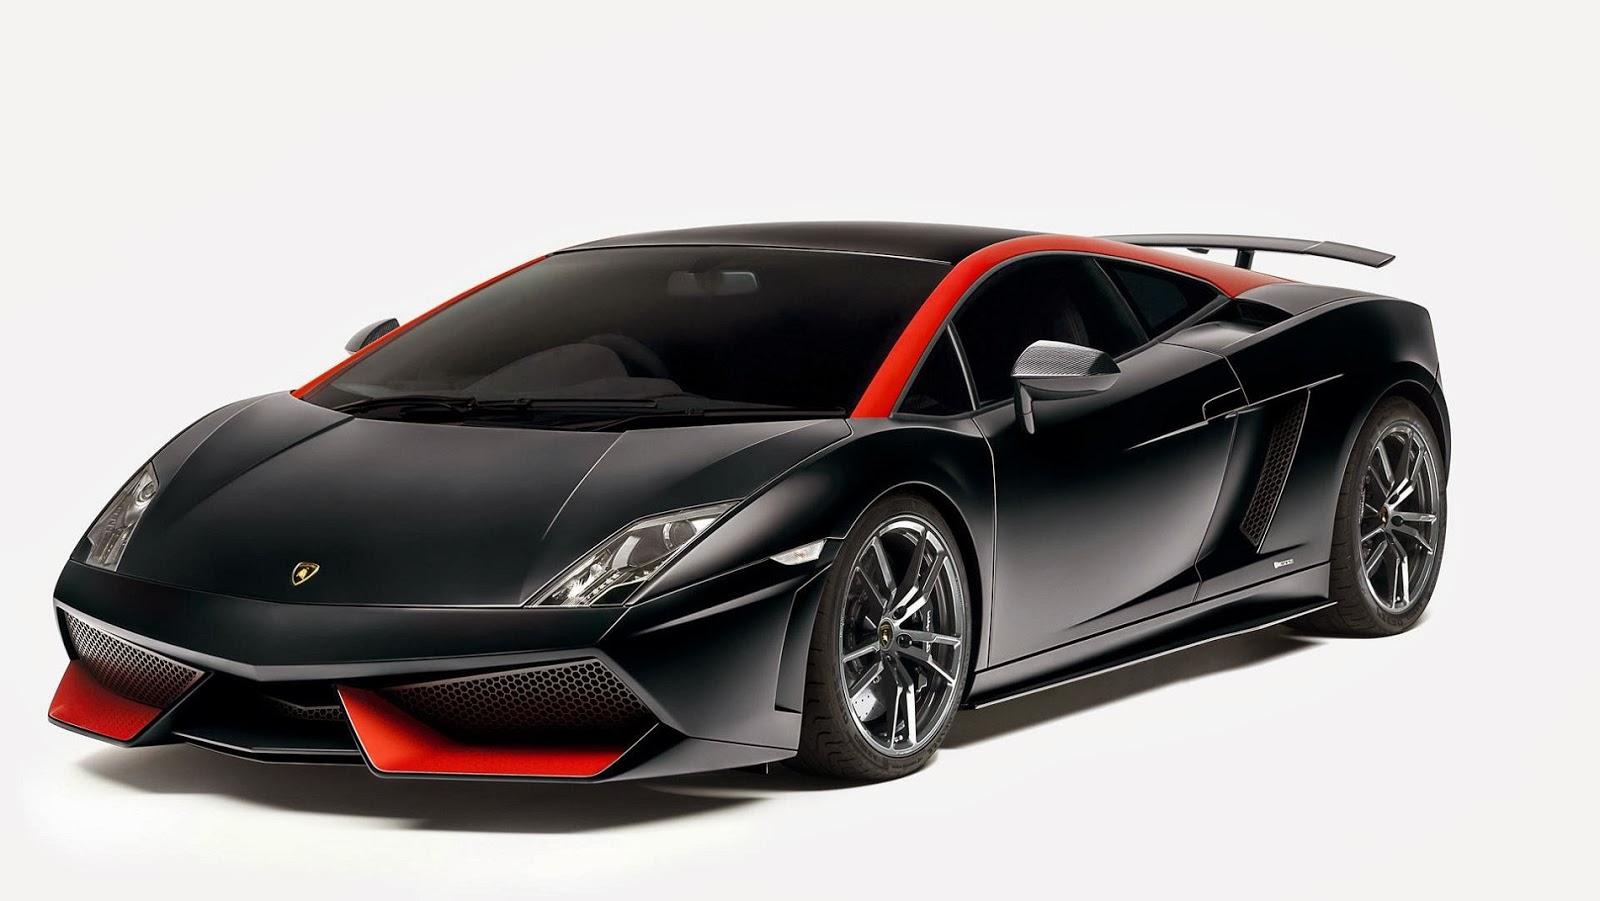 Red And Black Lamborghini Wallpaper 27 Hd Wallpaper Hdblackwallpaper Com